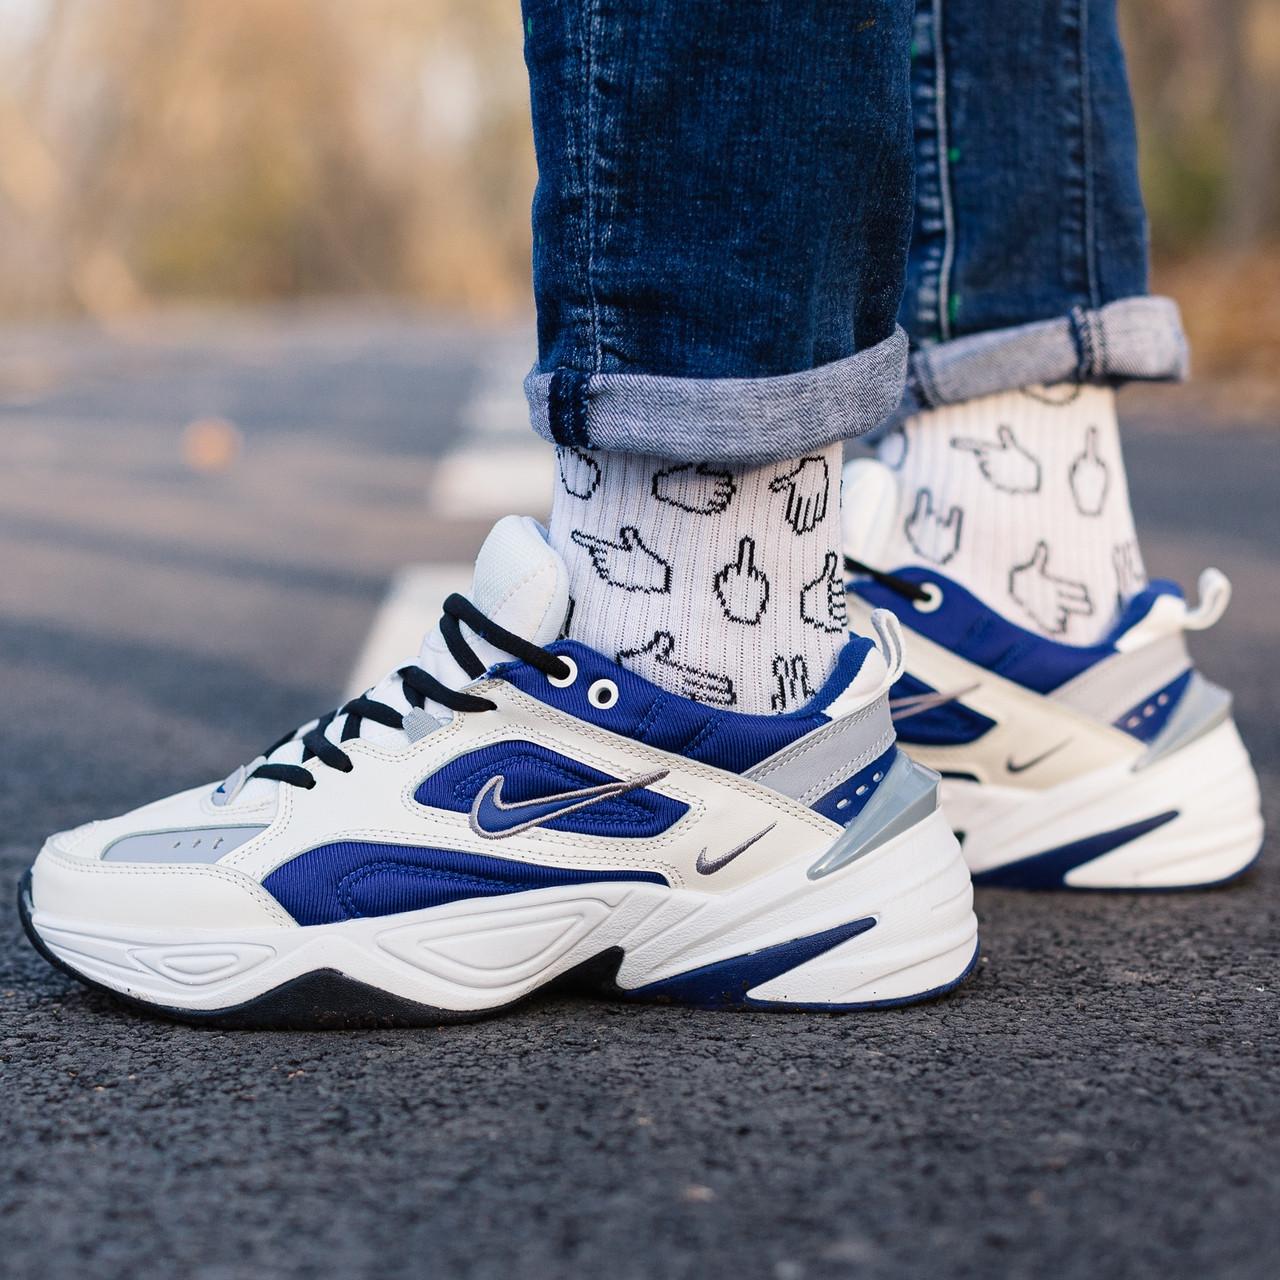 Кроссовки мужские Nike M2K Tekno белые-синие (Top replic)